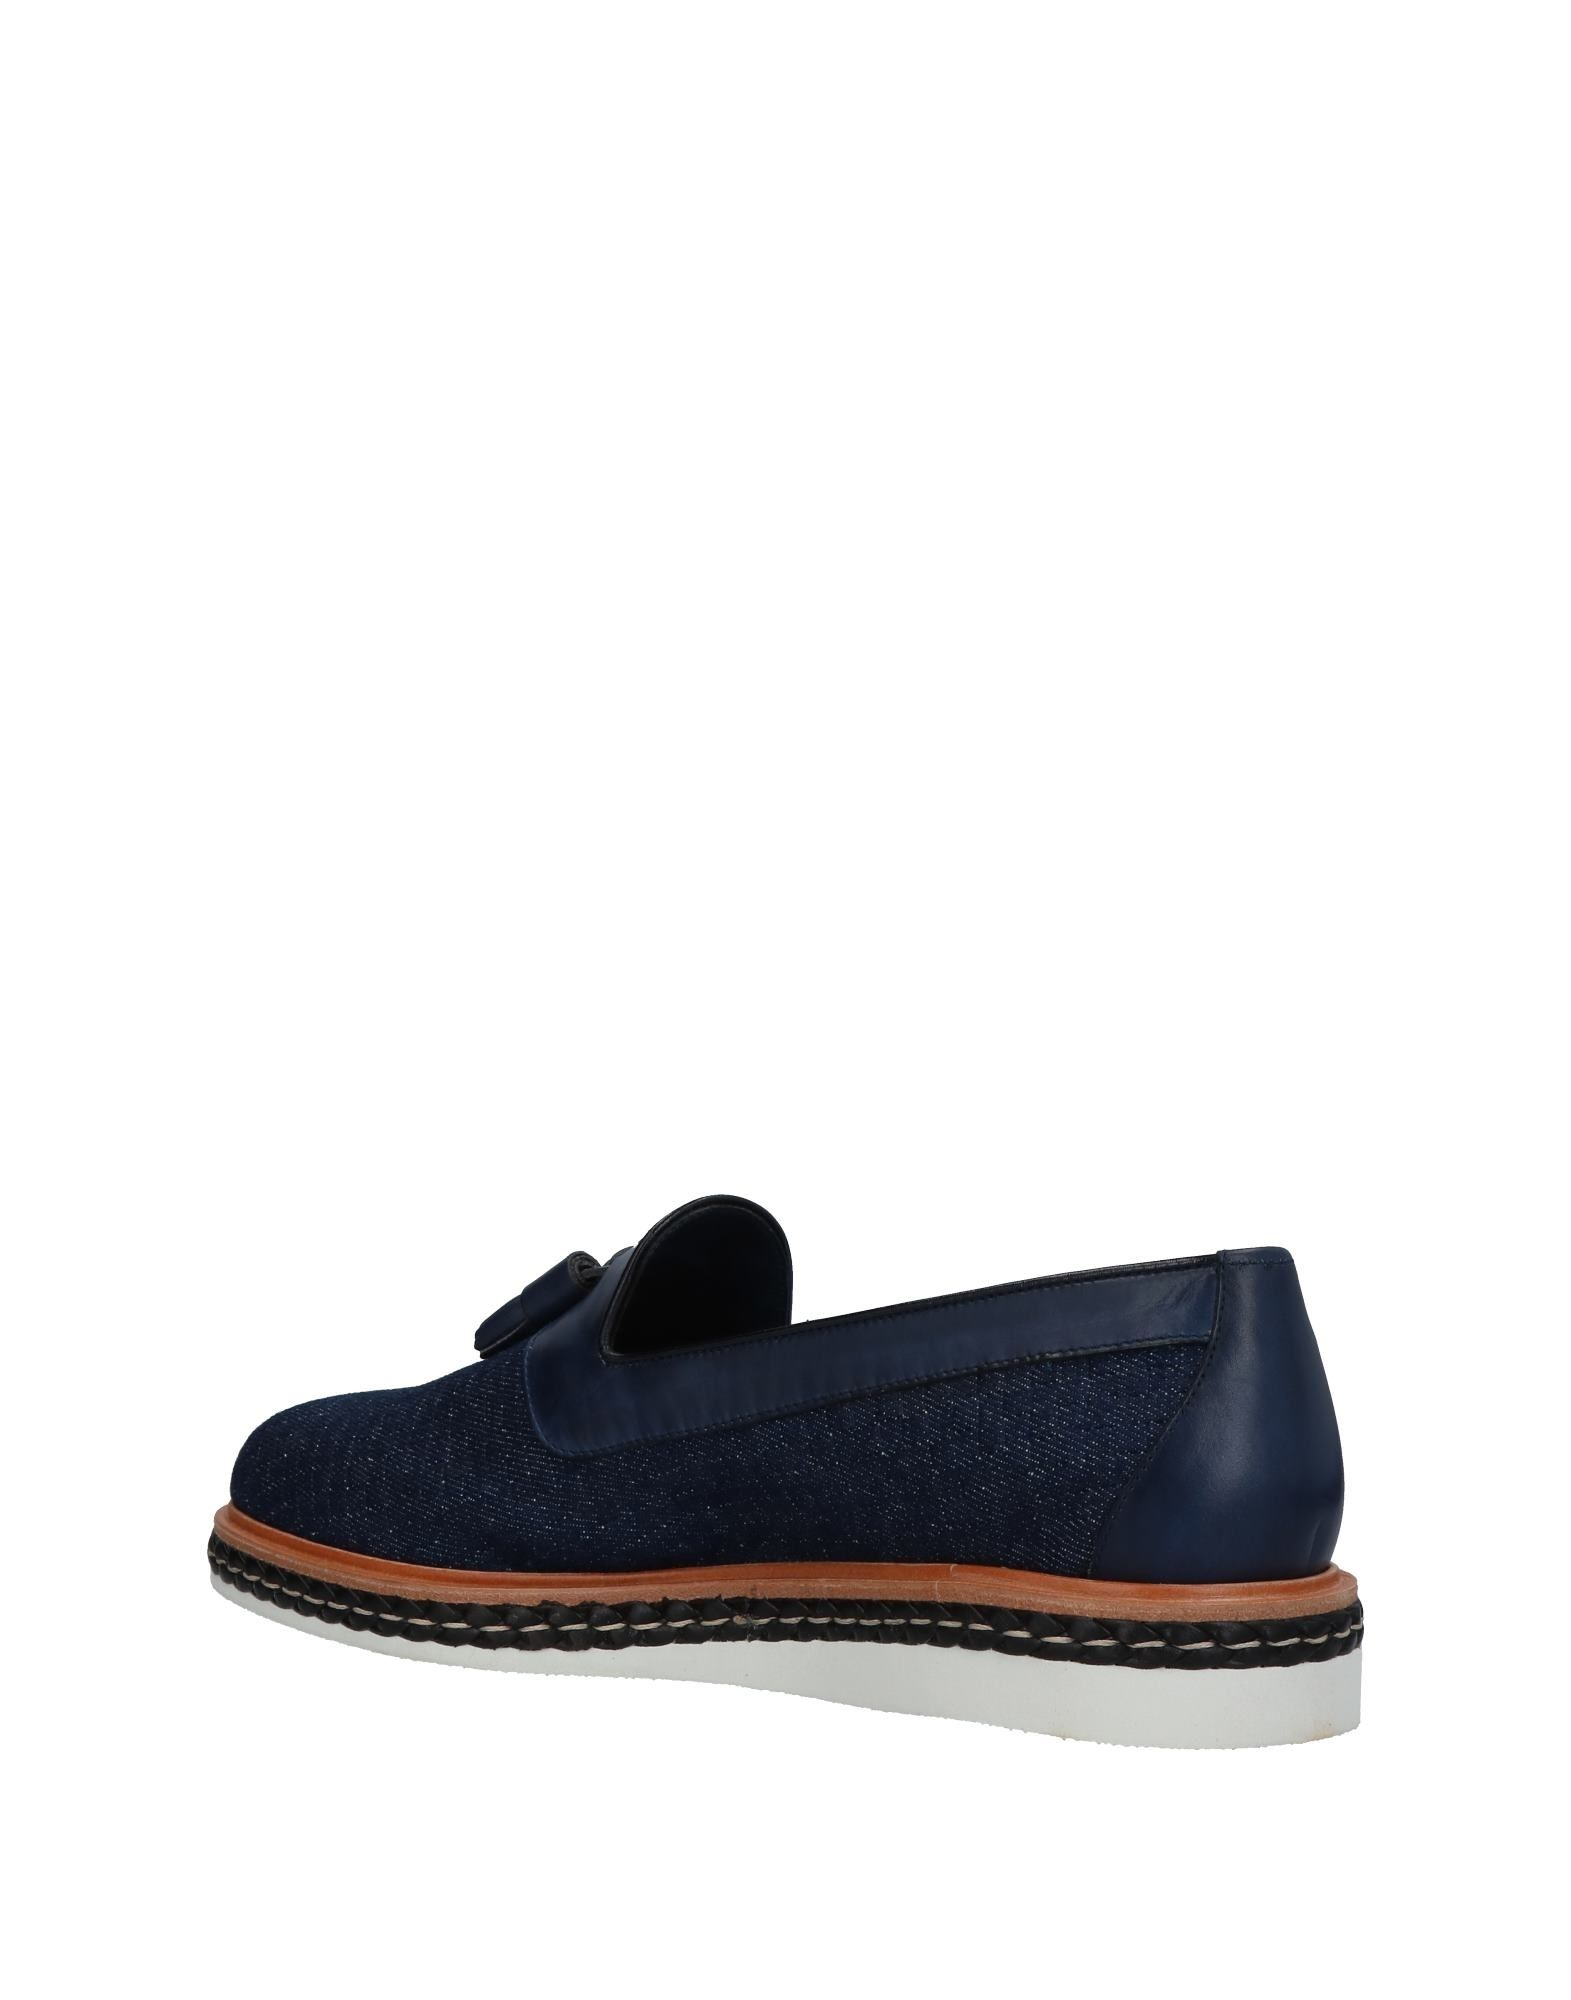 Santoni Mokassins Herren  11410153OS Heiße Schuhe c0f53d